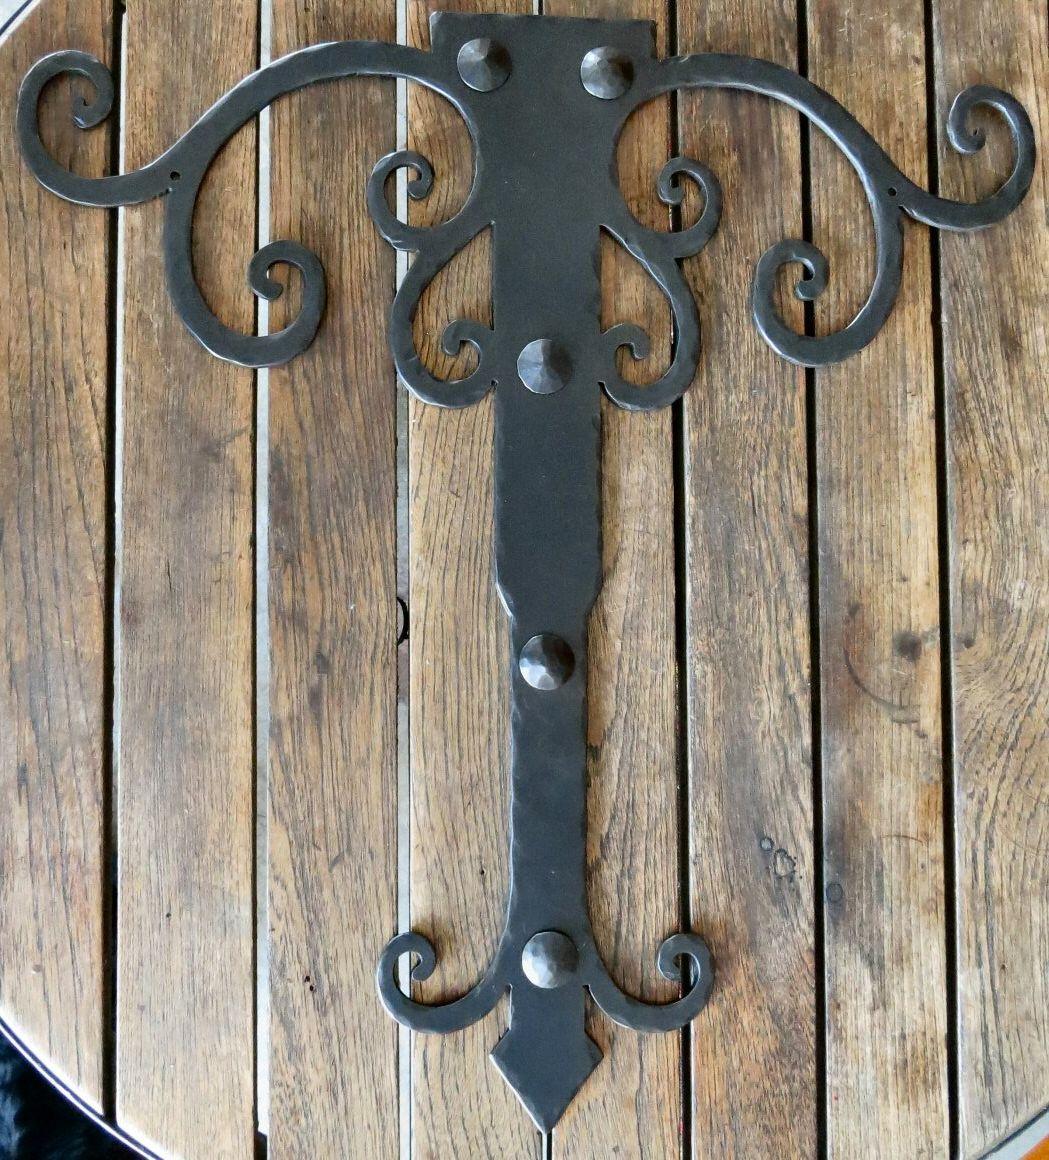 Mid Century Iron Hinge Strap HHS 310 | Hinge Straps | Pinterest | Mid  Century, Iron And Hardware